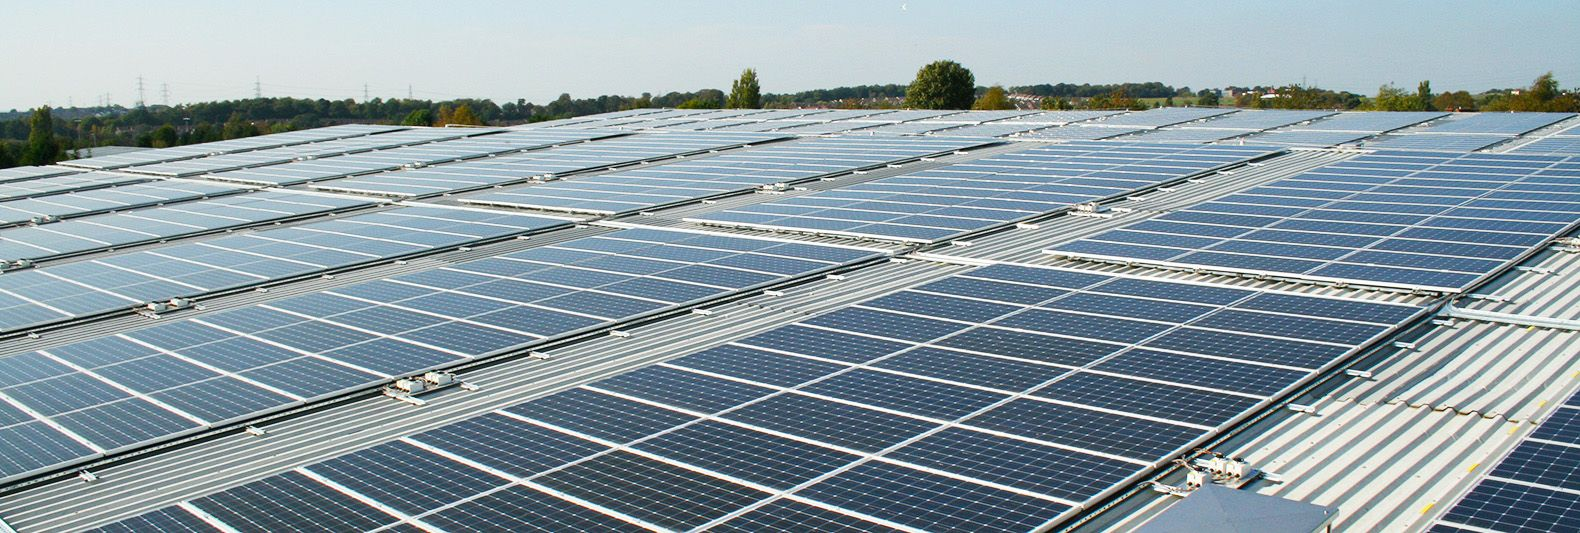 Tesla To Power Gigafactory With World S Largest Solar Rooftop Installation Tesla Solar Installation